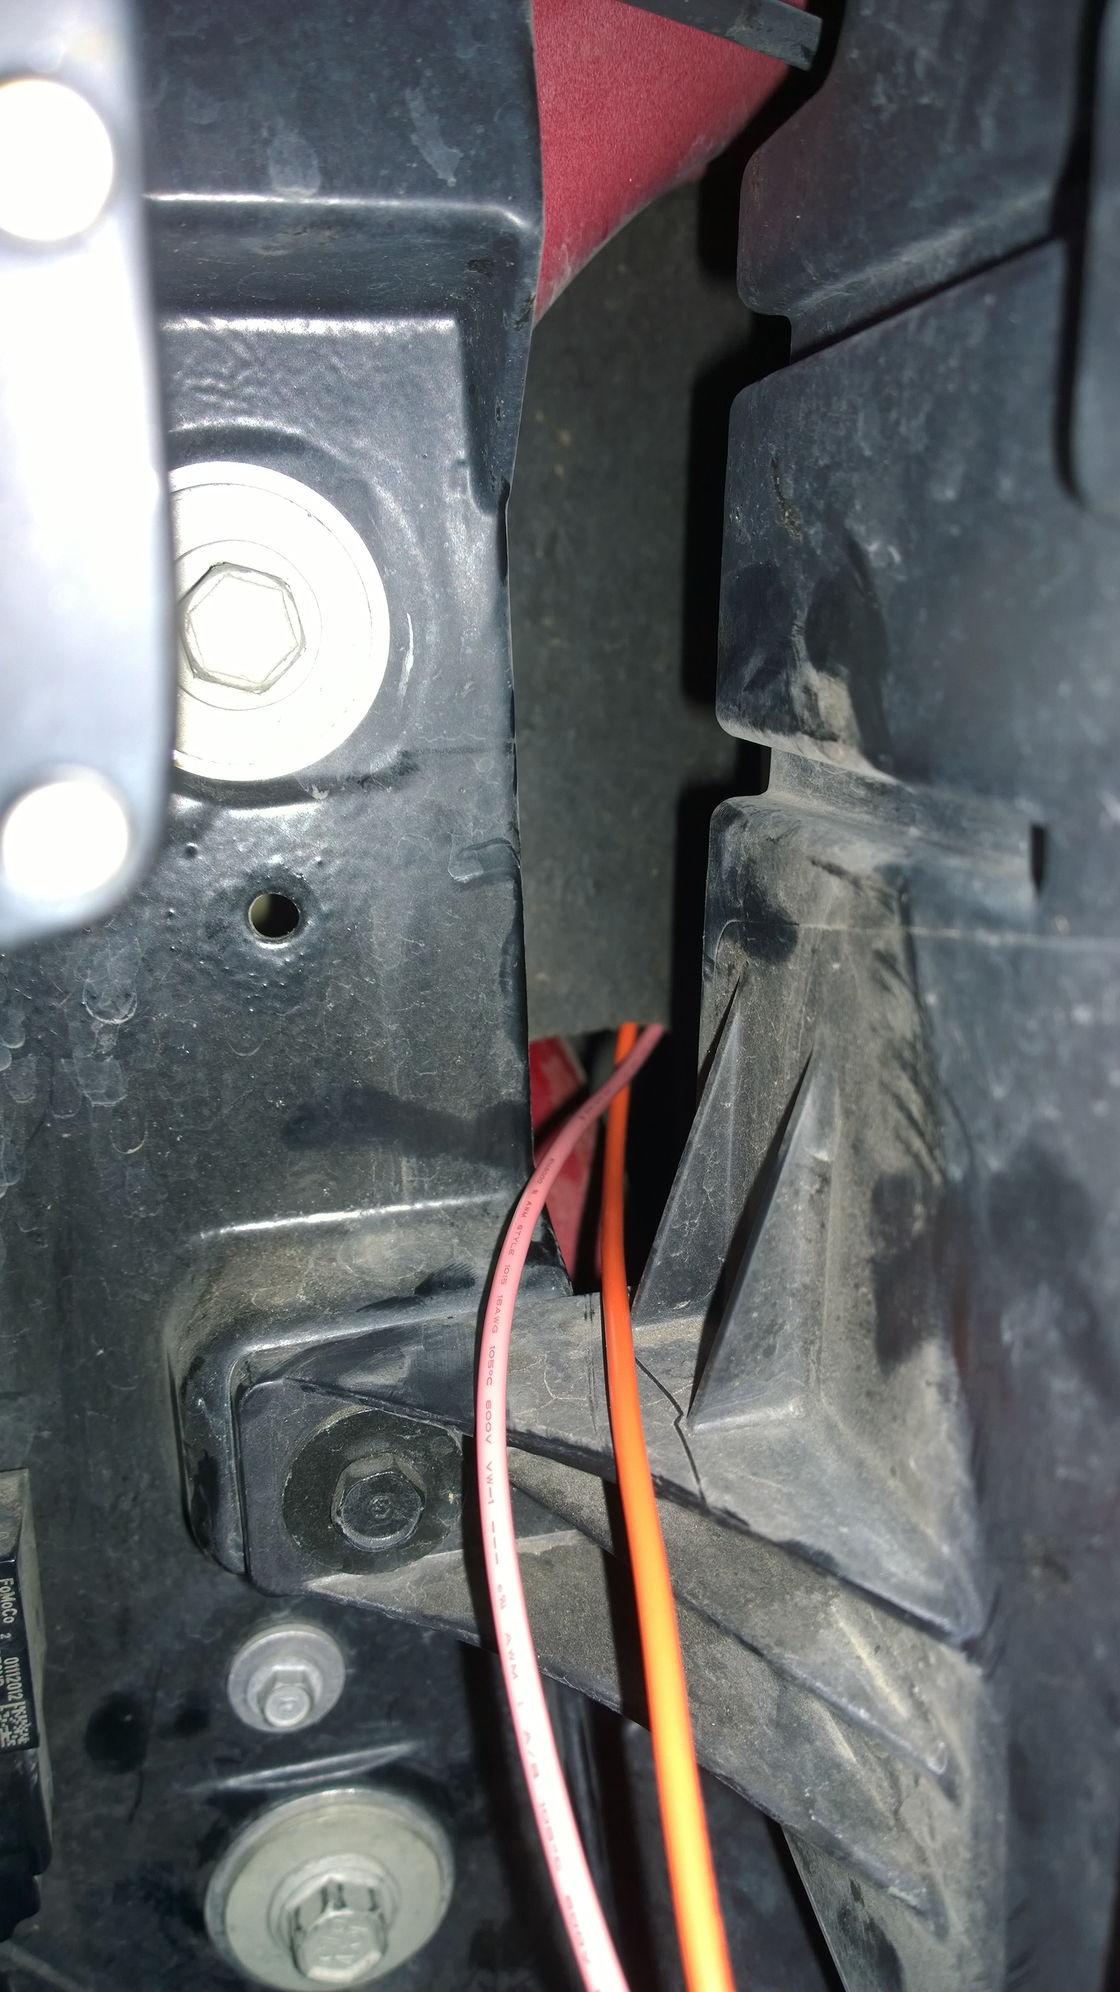 80-2014_09_17_19_43_00_1_5dd724d9c9d63f450db93085c544de9279fd5d4b  F Fuse Box Under Hood on 2000 f150 interior door panel, 1996 f150 fuse box, 2000 f150 wiring harness, 2000 f150 power window switch, 2000 f150 roof, 1993 f150 fuse box, 2000 f150 center cap, 2000 f150 windshield, 2000 f150 fuse identification chart, 2000 f150 steering column, 2000 f150 speaker size, 2006 f150 fuse box, 2001 f150 fuse box, 1974 nova fuse box, 2000 f150 brake booster, 2000 f150 camshaft, 2000 f150 camper shell, 2000 f150 door latch, 03 f150 fuse box, 2000 f150 fuse replacement chart,